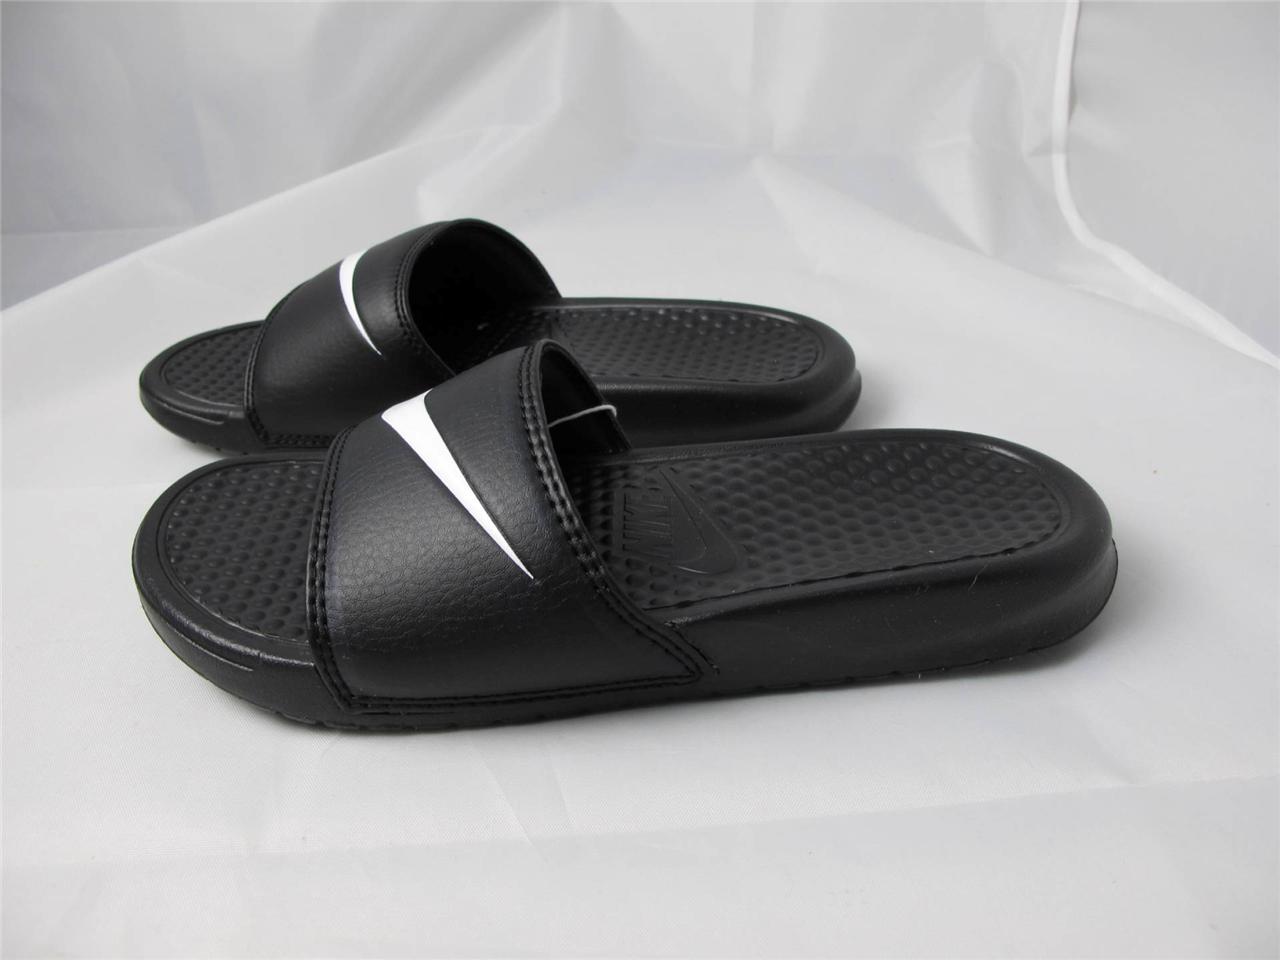 3c3b90bc98b4 La foto se está cargando Nuevo-Para-Mujer-Nike-Benassi-Swoosh-312432-010-